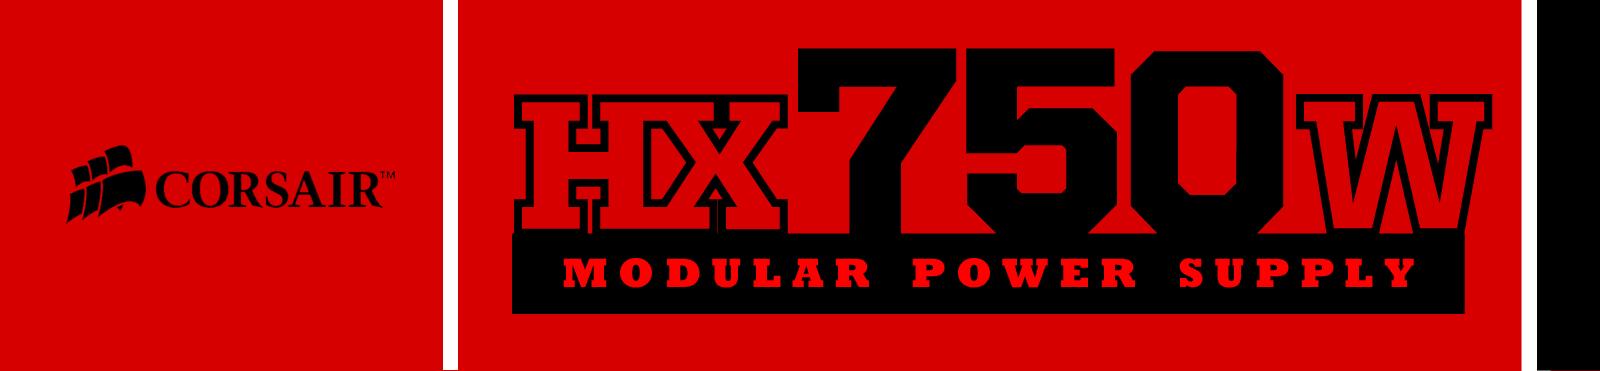 corsair_tx_750_psu_sticker_by_jammo2k5-d47c62e.jpg